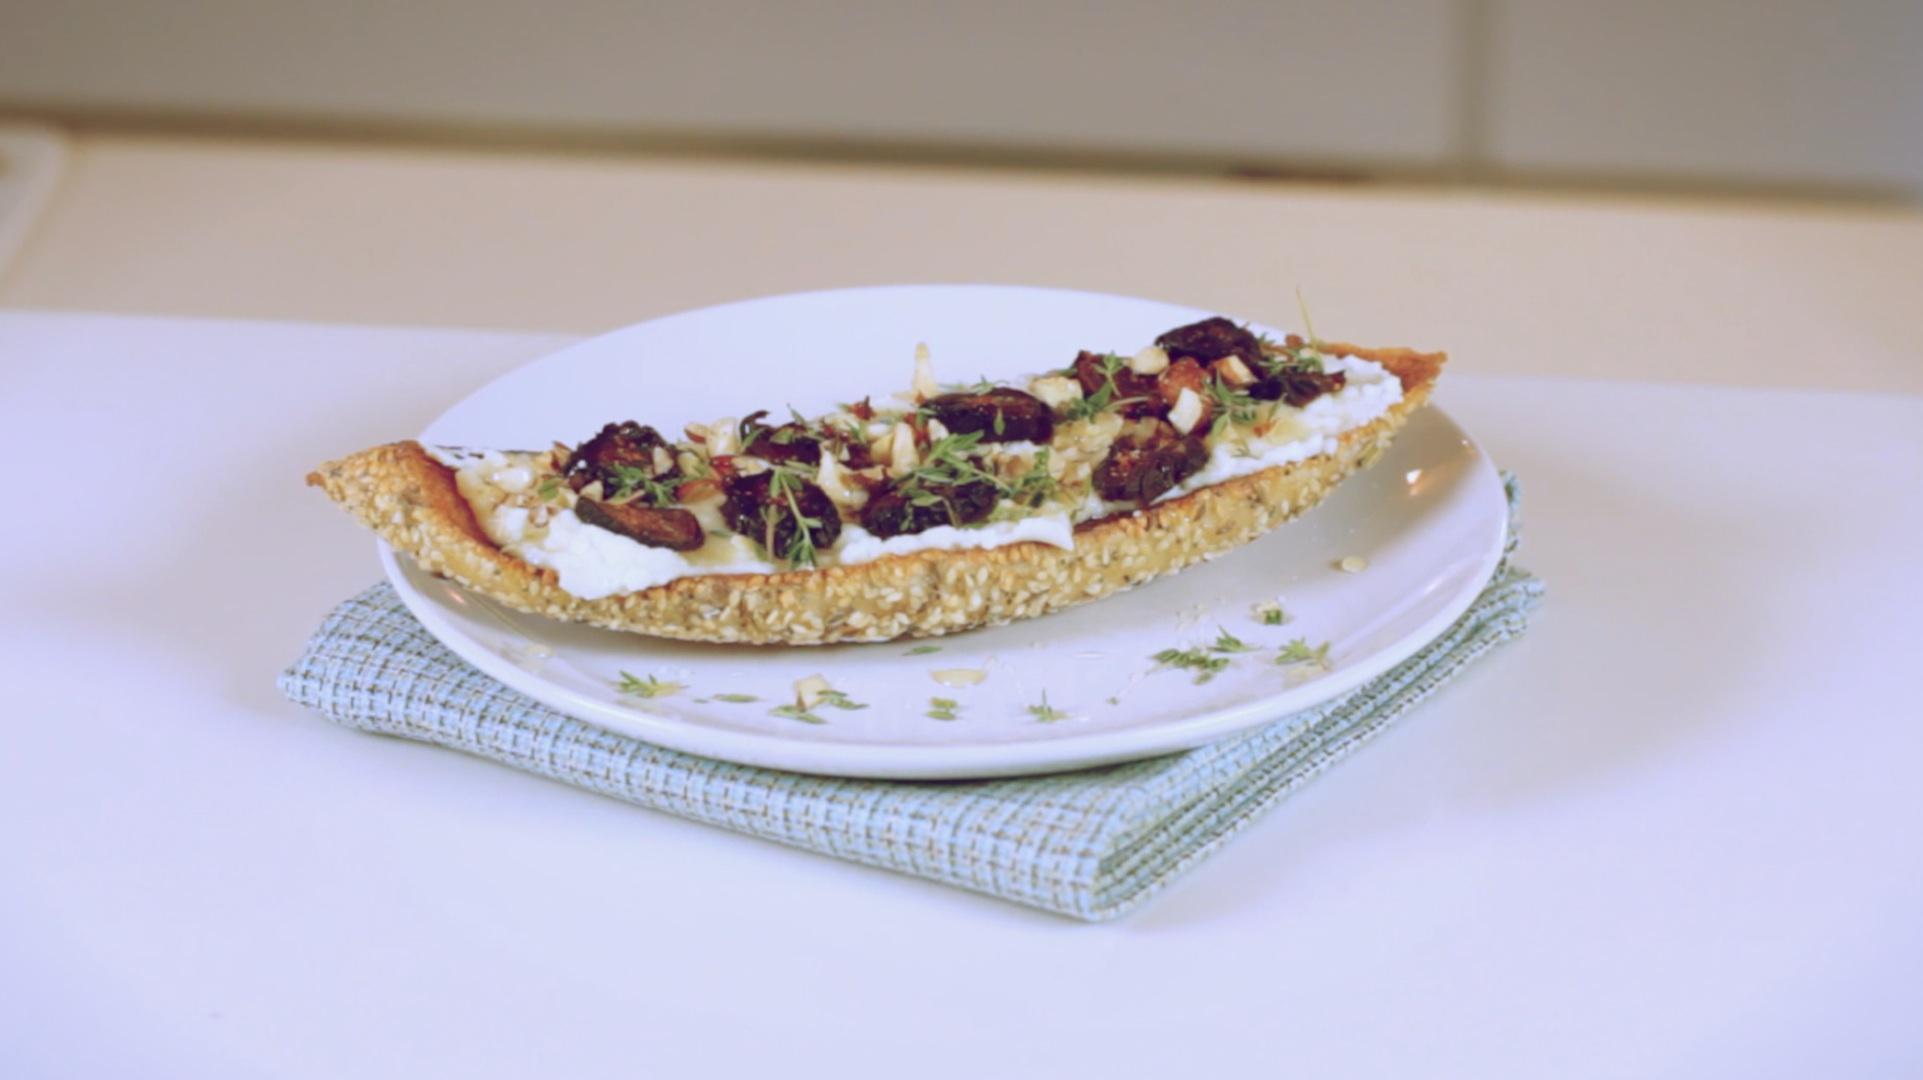 Make a Dried Fig and Ricotta Tartine